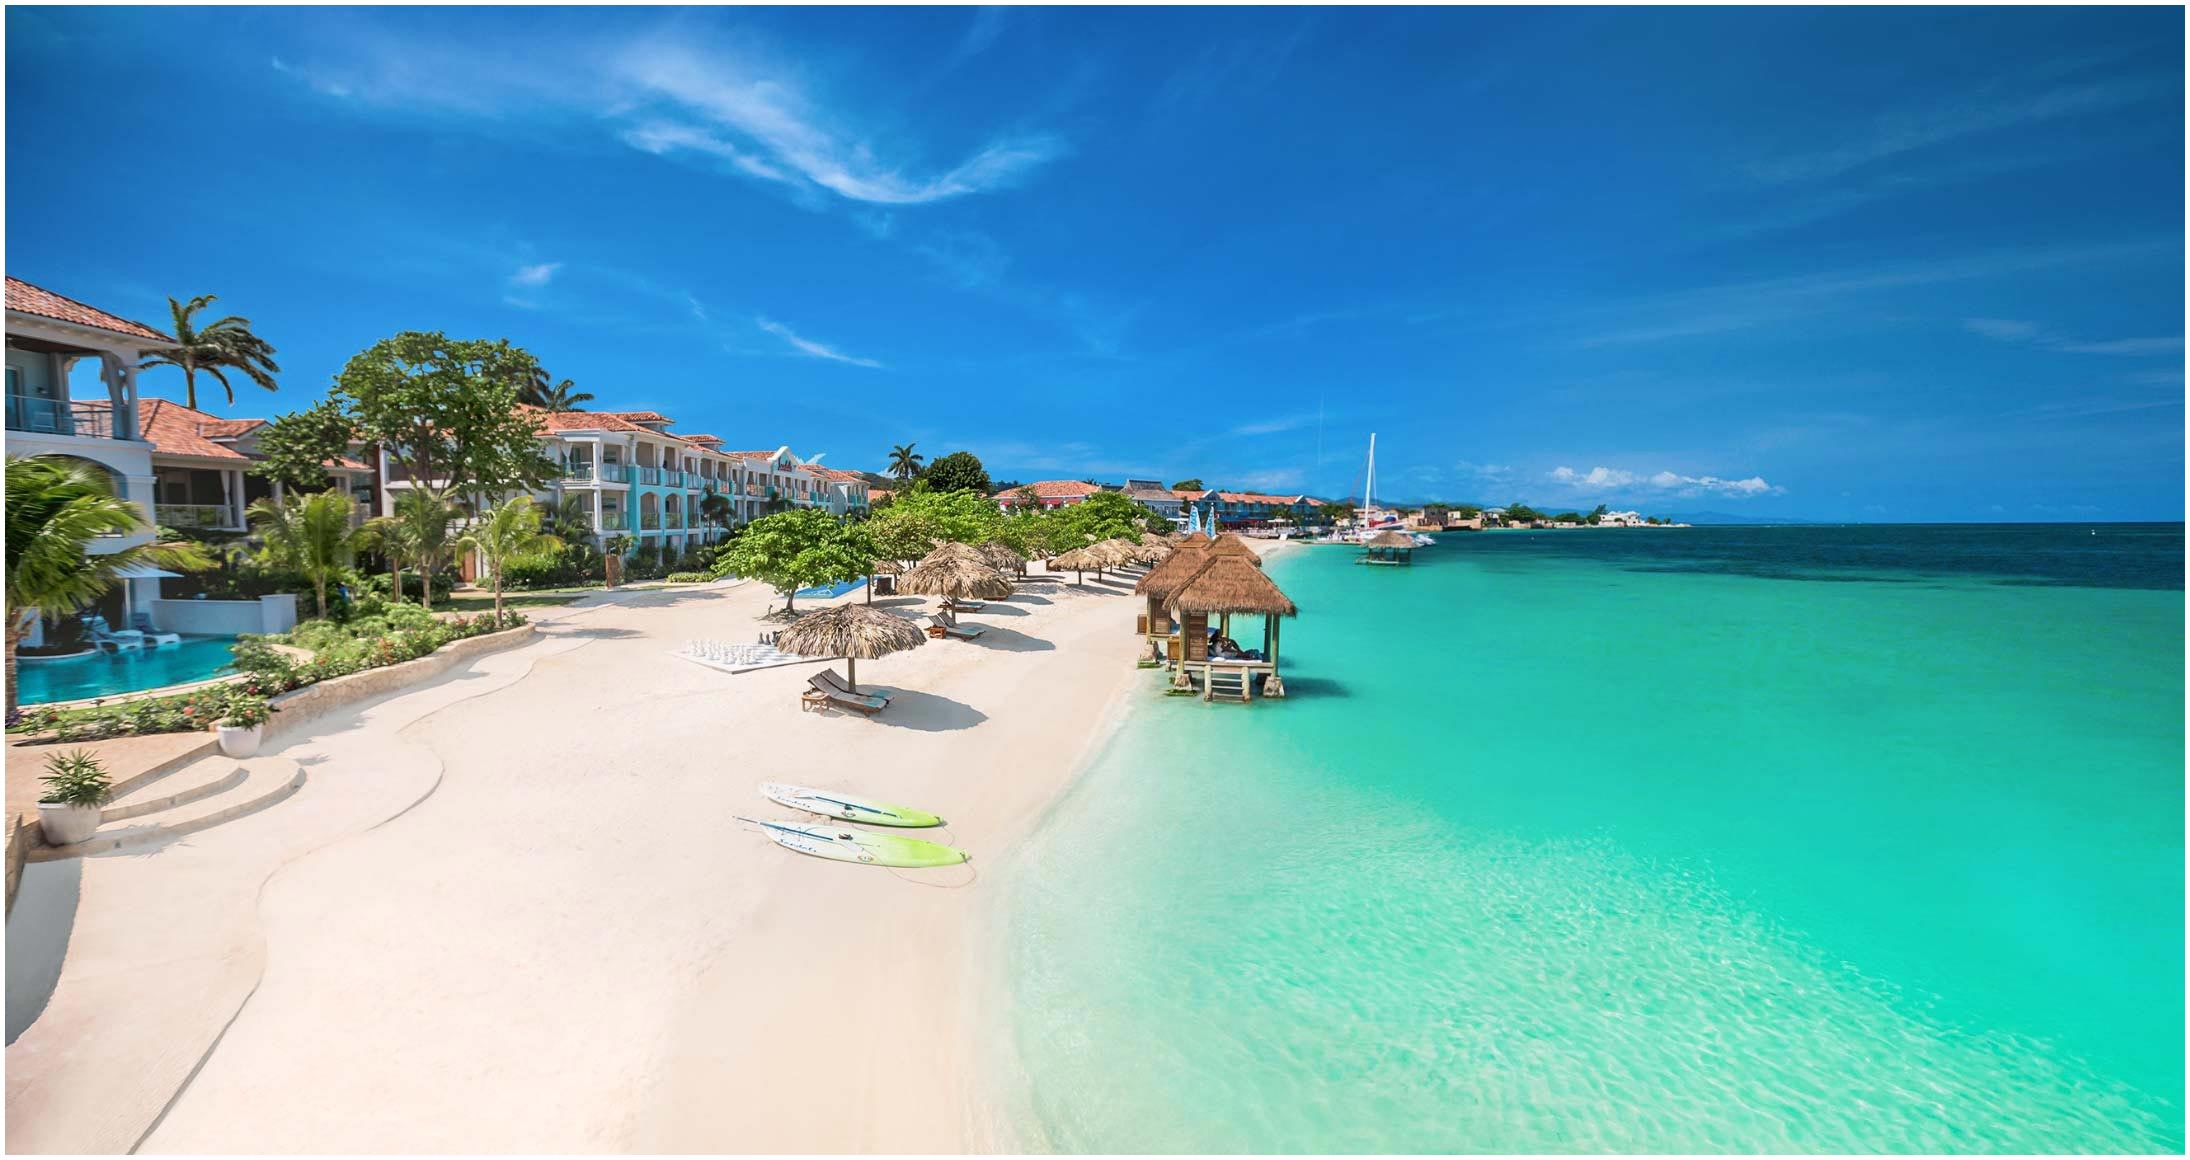 Best Luxury Italian Beach Resorts Elegant Sandals Grande St Lucian All Inclusive Luxury Resort In St Lucia